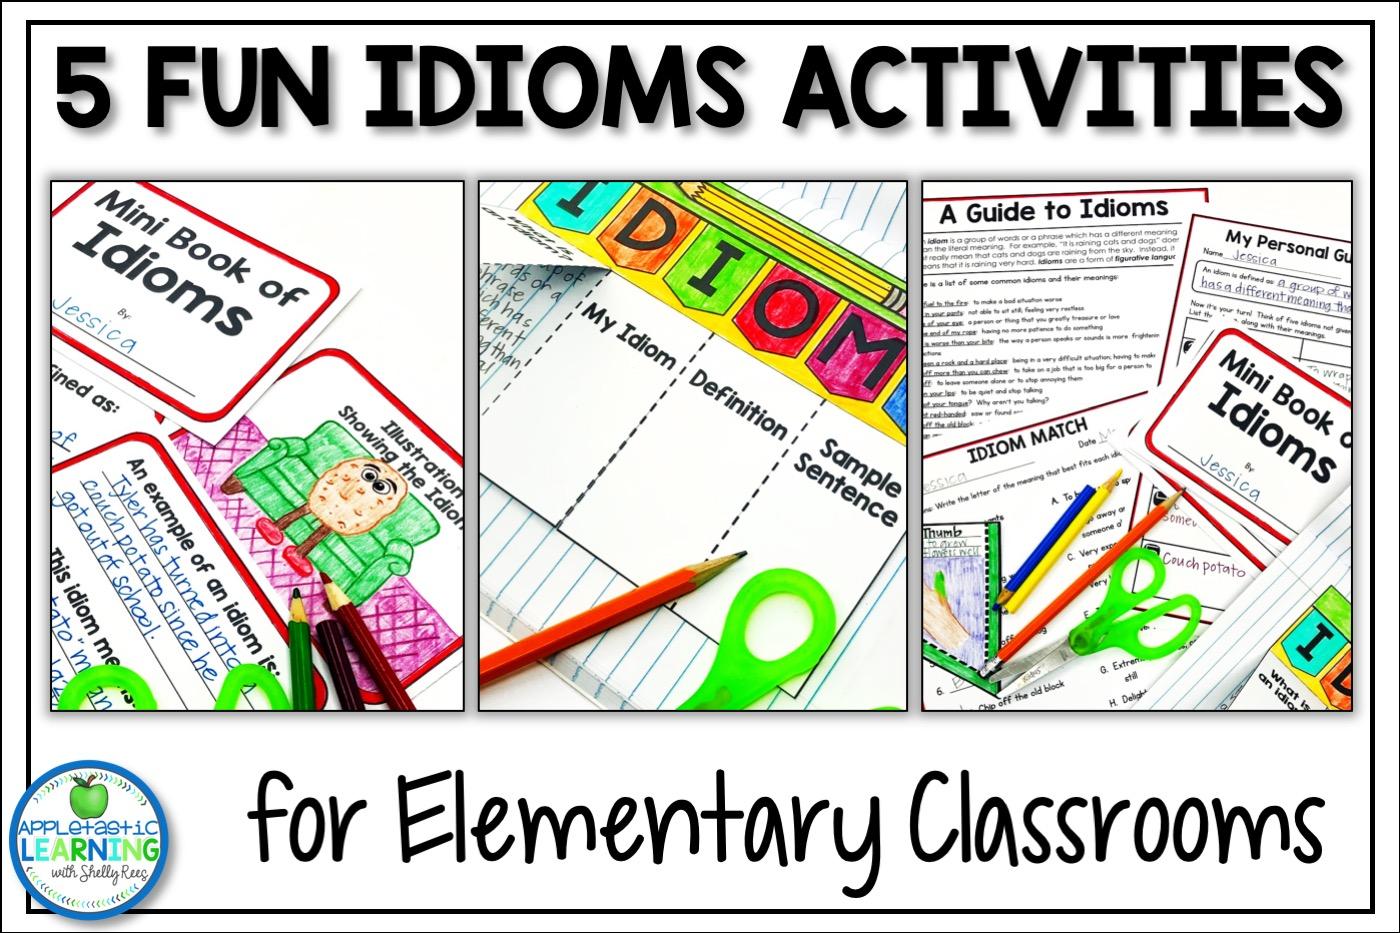 hight resolution of 5 Fun Idiom Activities - Appletastic Learning